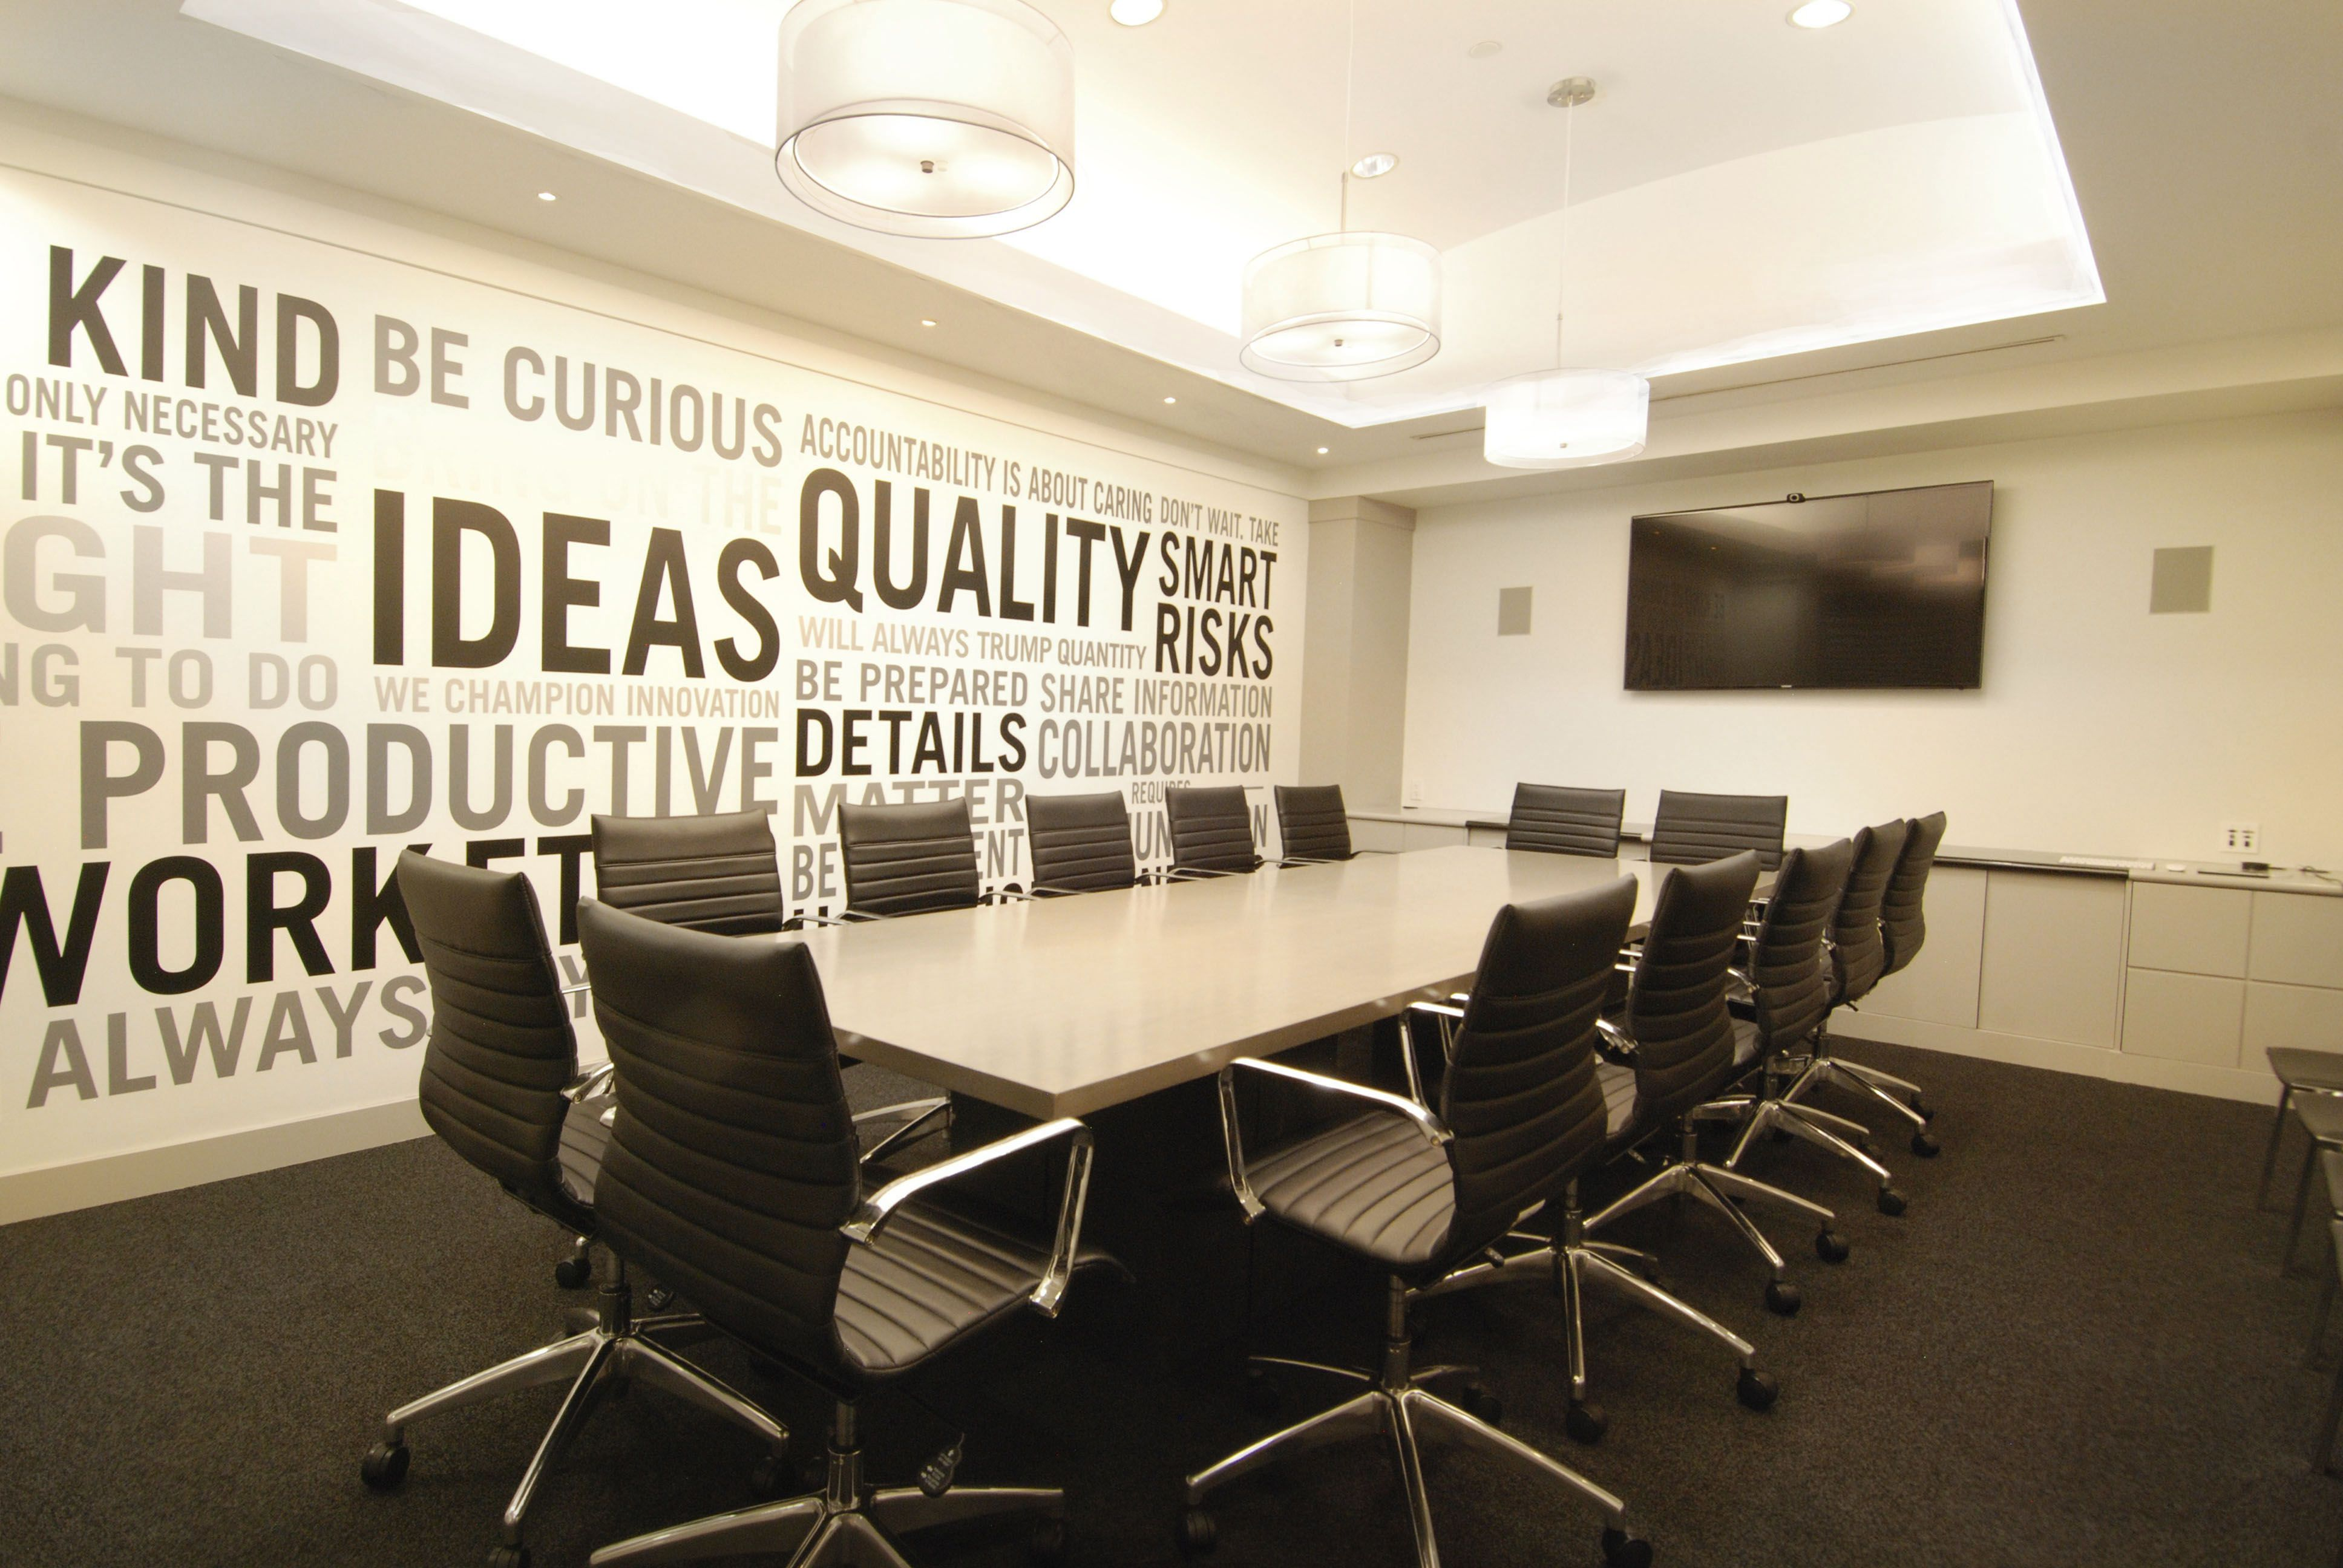 Creative Wall Decoration With Quotes For Wonderful Office Conference Room Design Ideas Kucuk Oda Tasarimi Ofis Ic Dekorasyonu Tasarim Oda